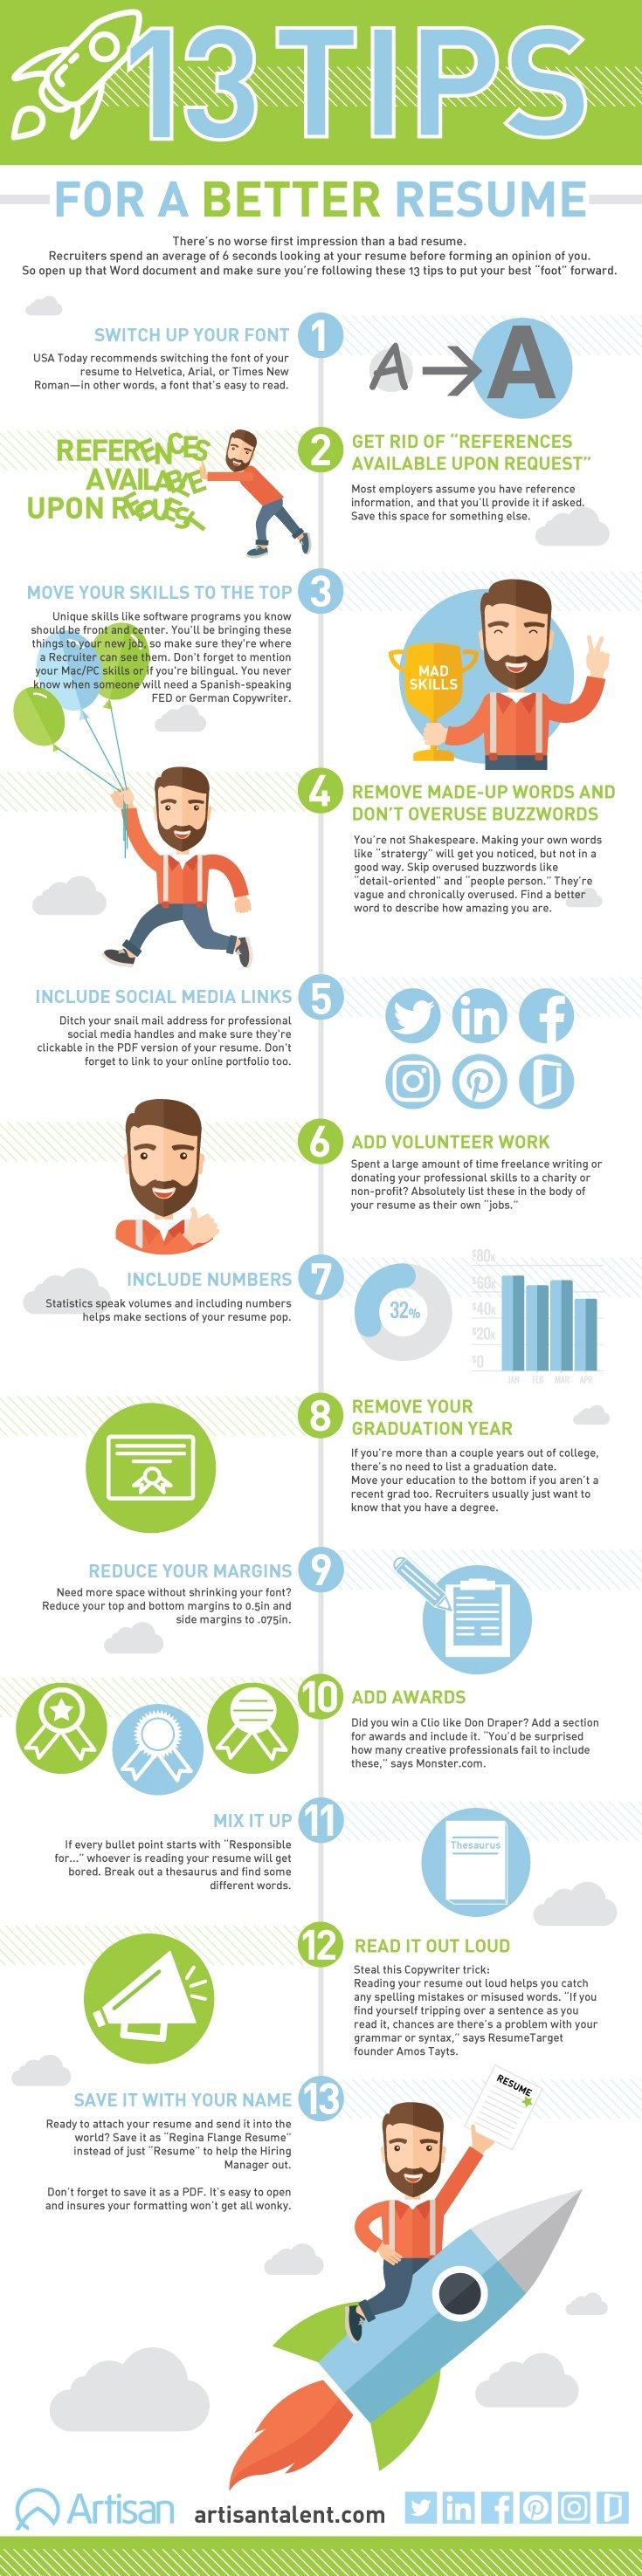 13 Tips for a Better Resume Infographic Artisan Talent.jpg